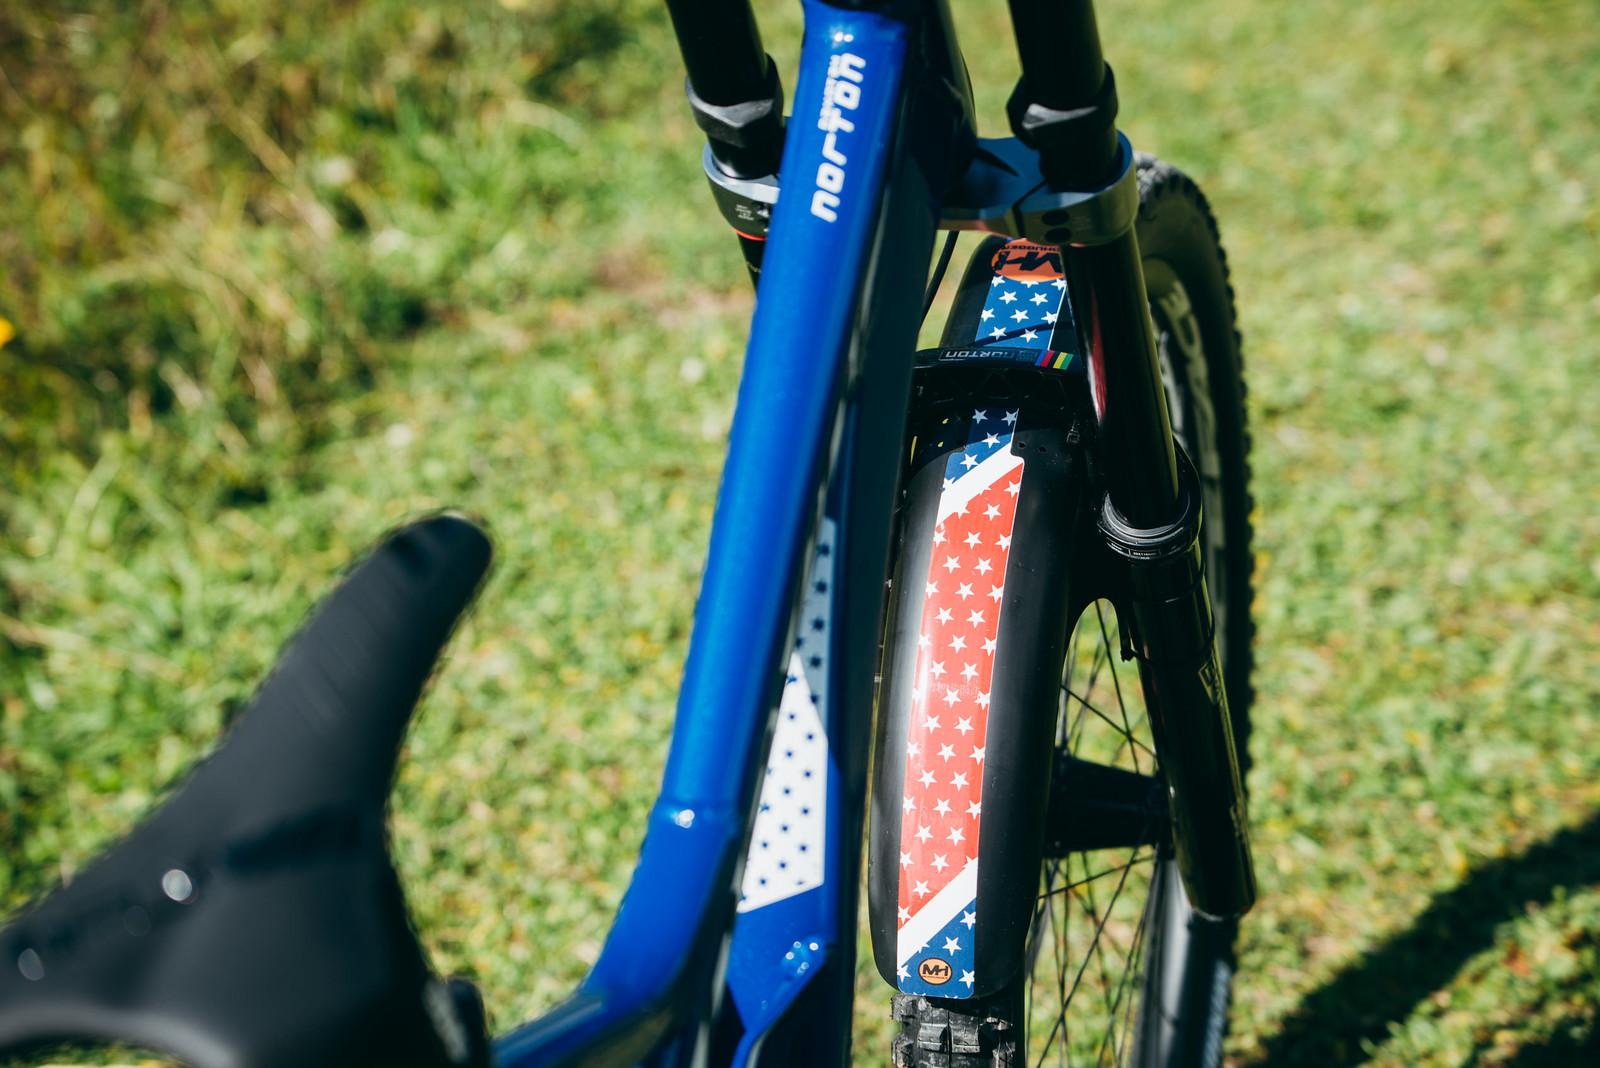 Custom Mudhugger Fender - WORLD CHAMPS BIKES - Unior/Devinci Factory Racing - Mountain Biking Pictures - Vital MTB